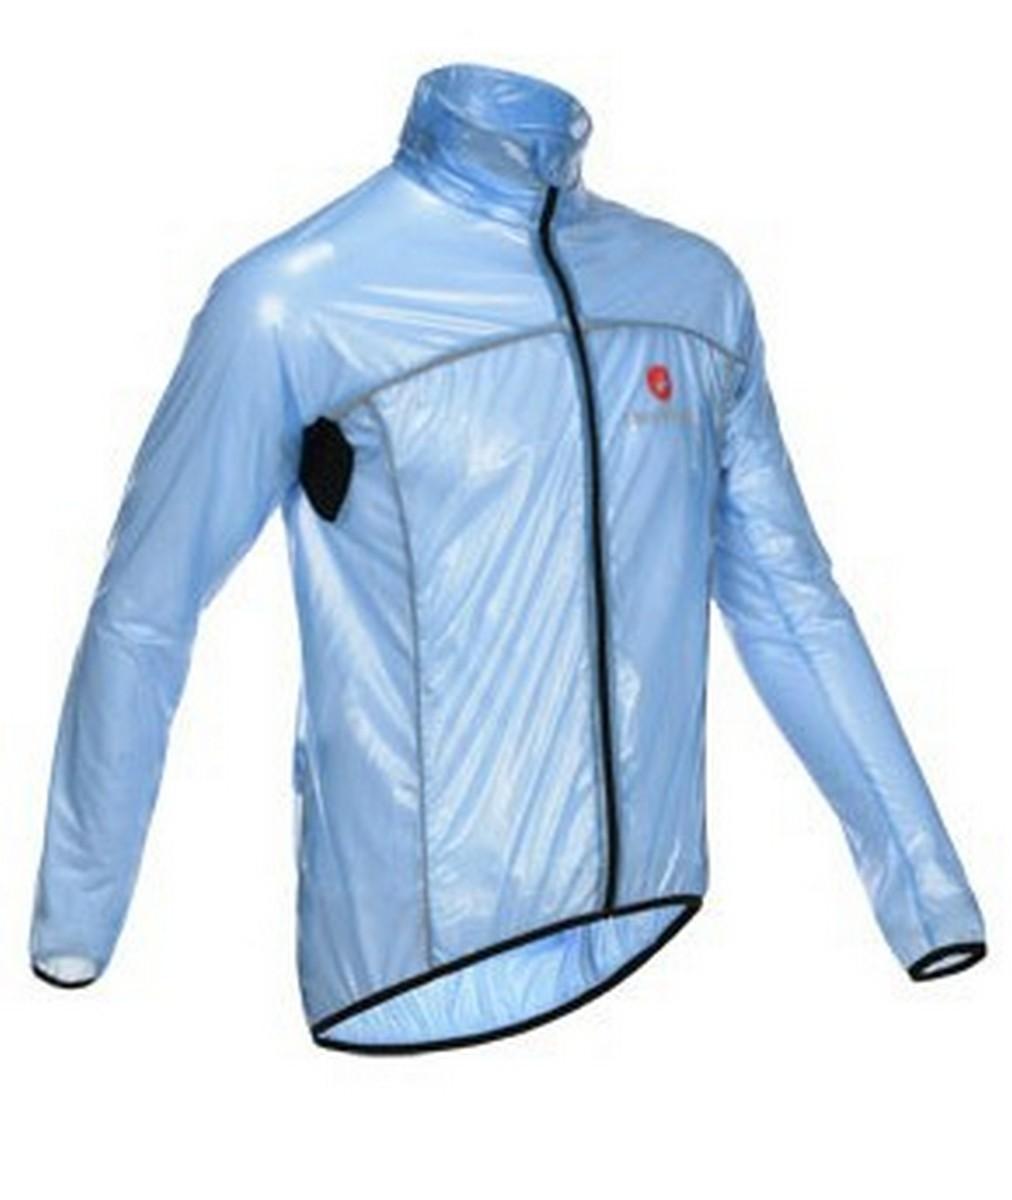 Куртка от дождя своими руками